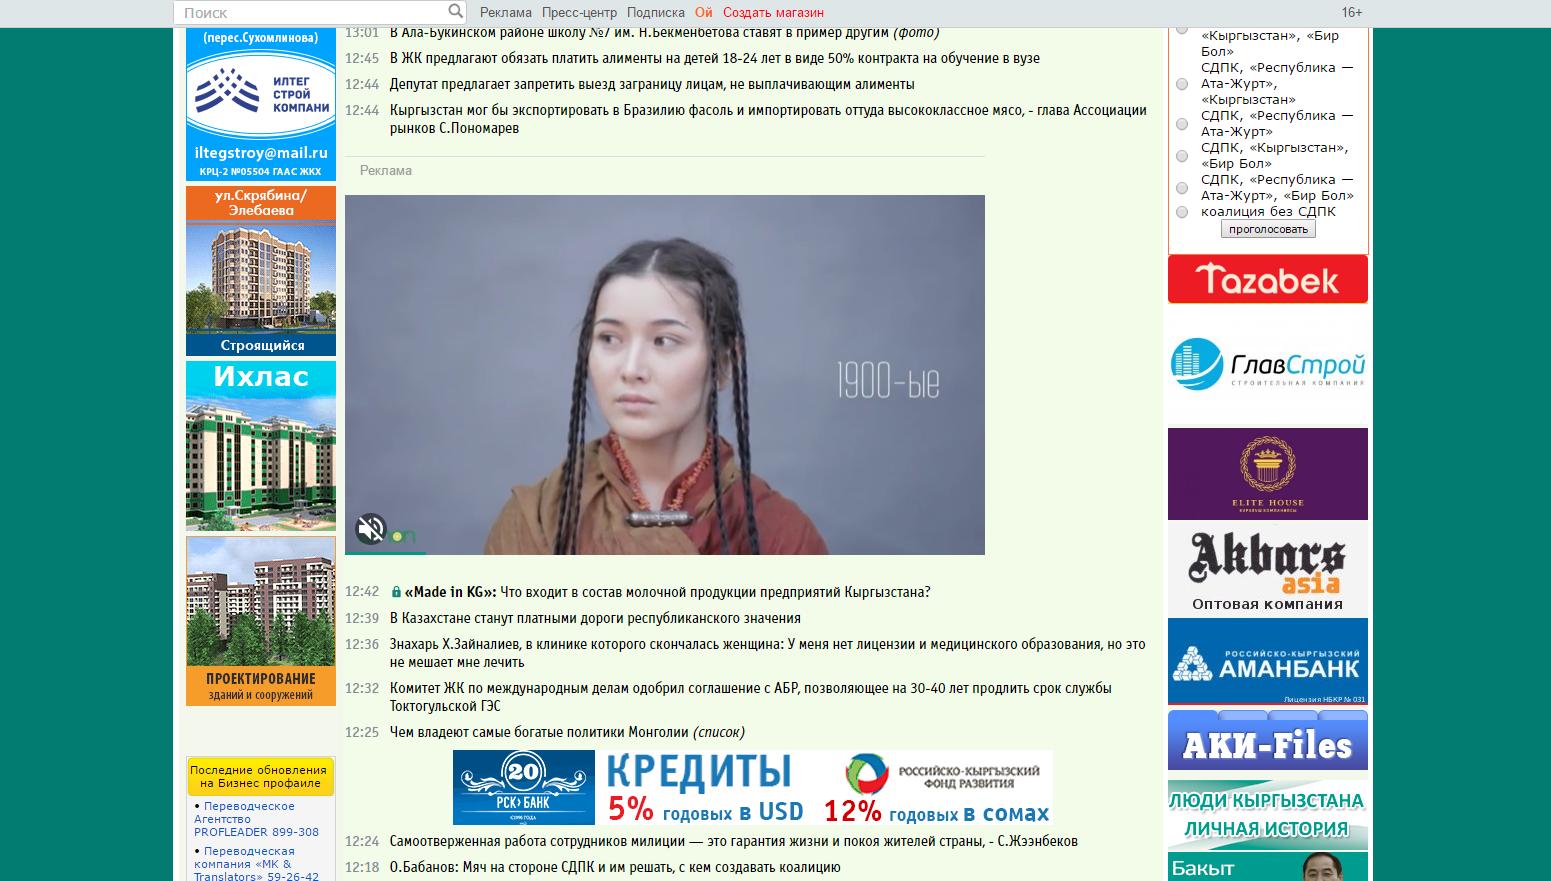 Видеоролик реклама о компании финка фото 529-252